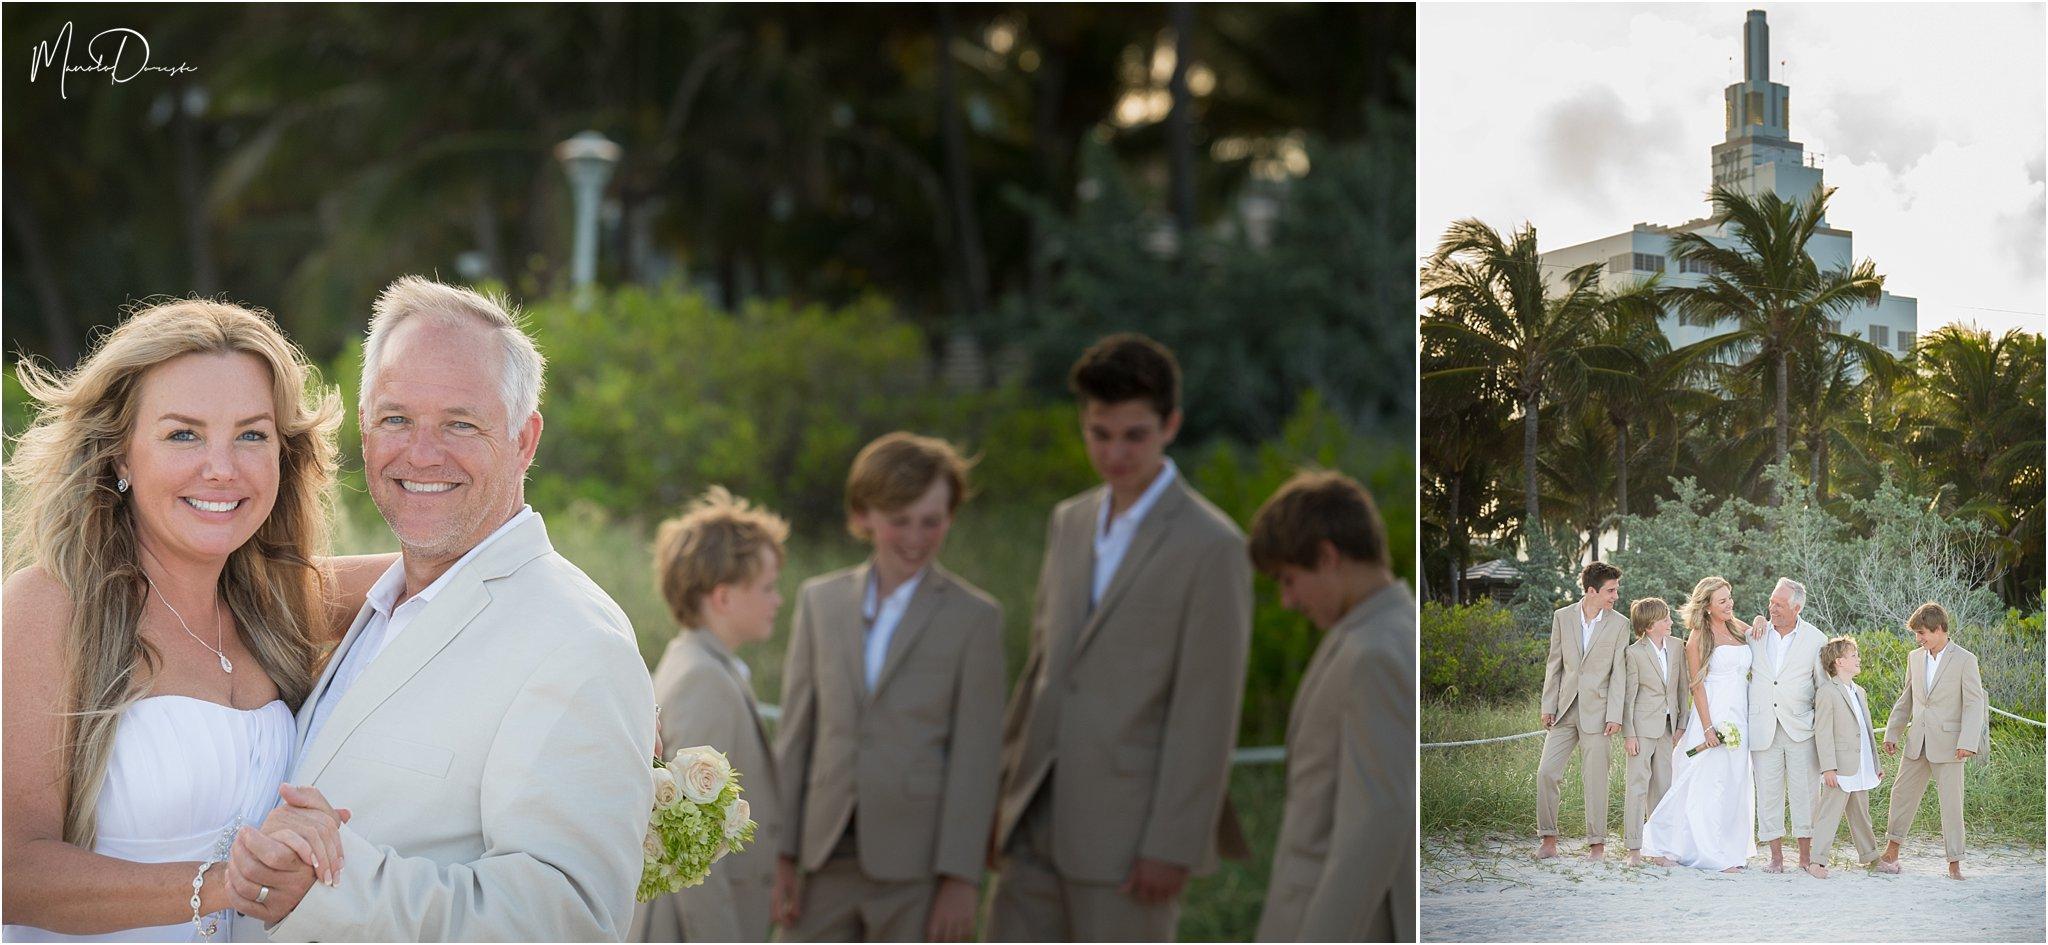 0396_ManoloDoreste_InFocusStudios_Wedding_Family_Photography_Miami_MiamiPhotographer.jpg